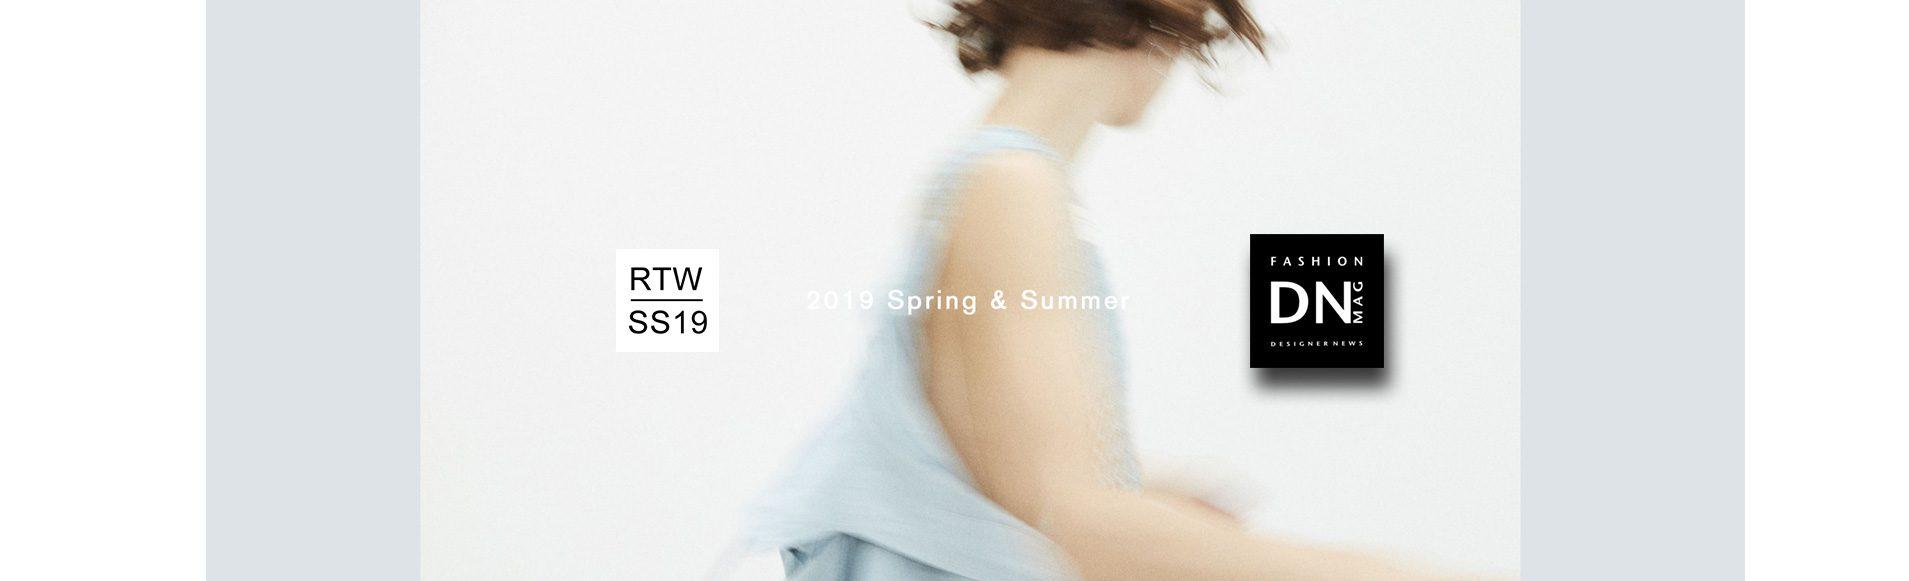 DNMAG-beautiful-people-RTW-SS19-Paris-Fashion-Week-2018